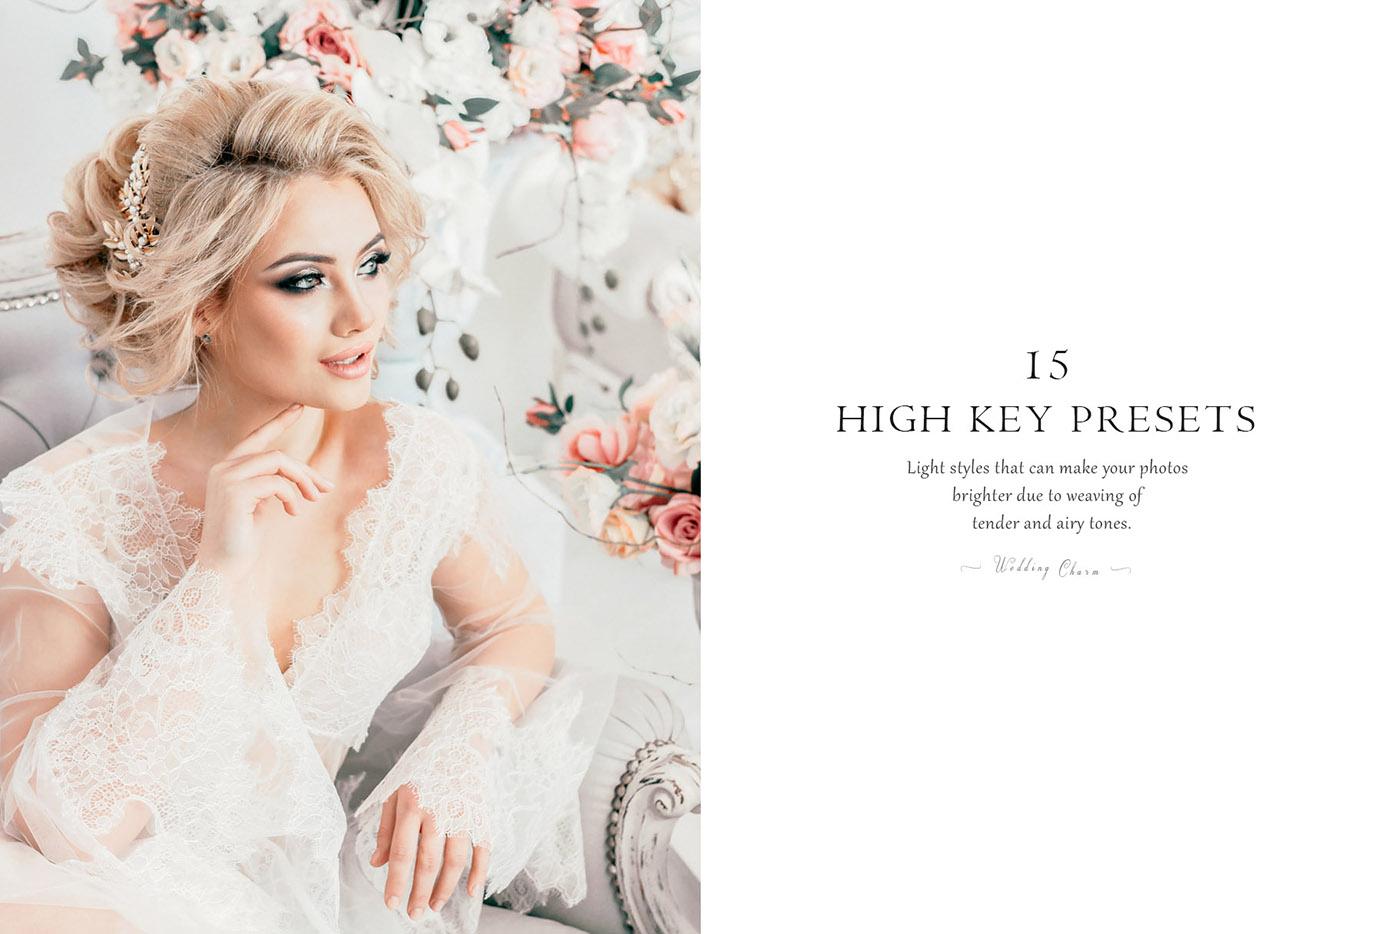 lightroom wedding presets common info tableHigh kEY 2